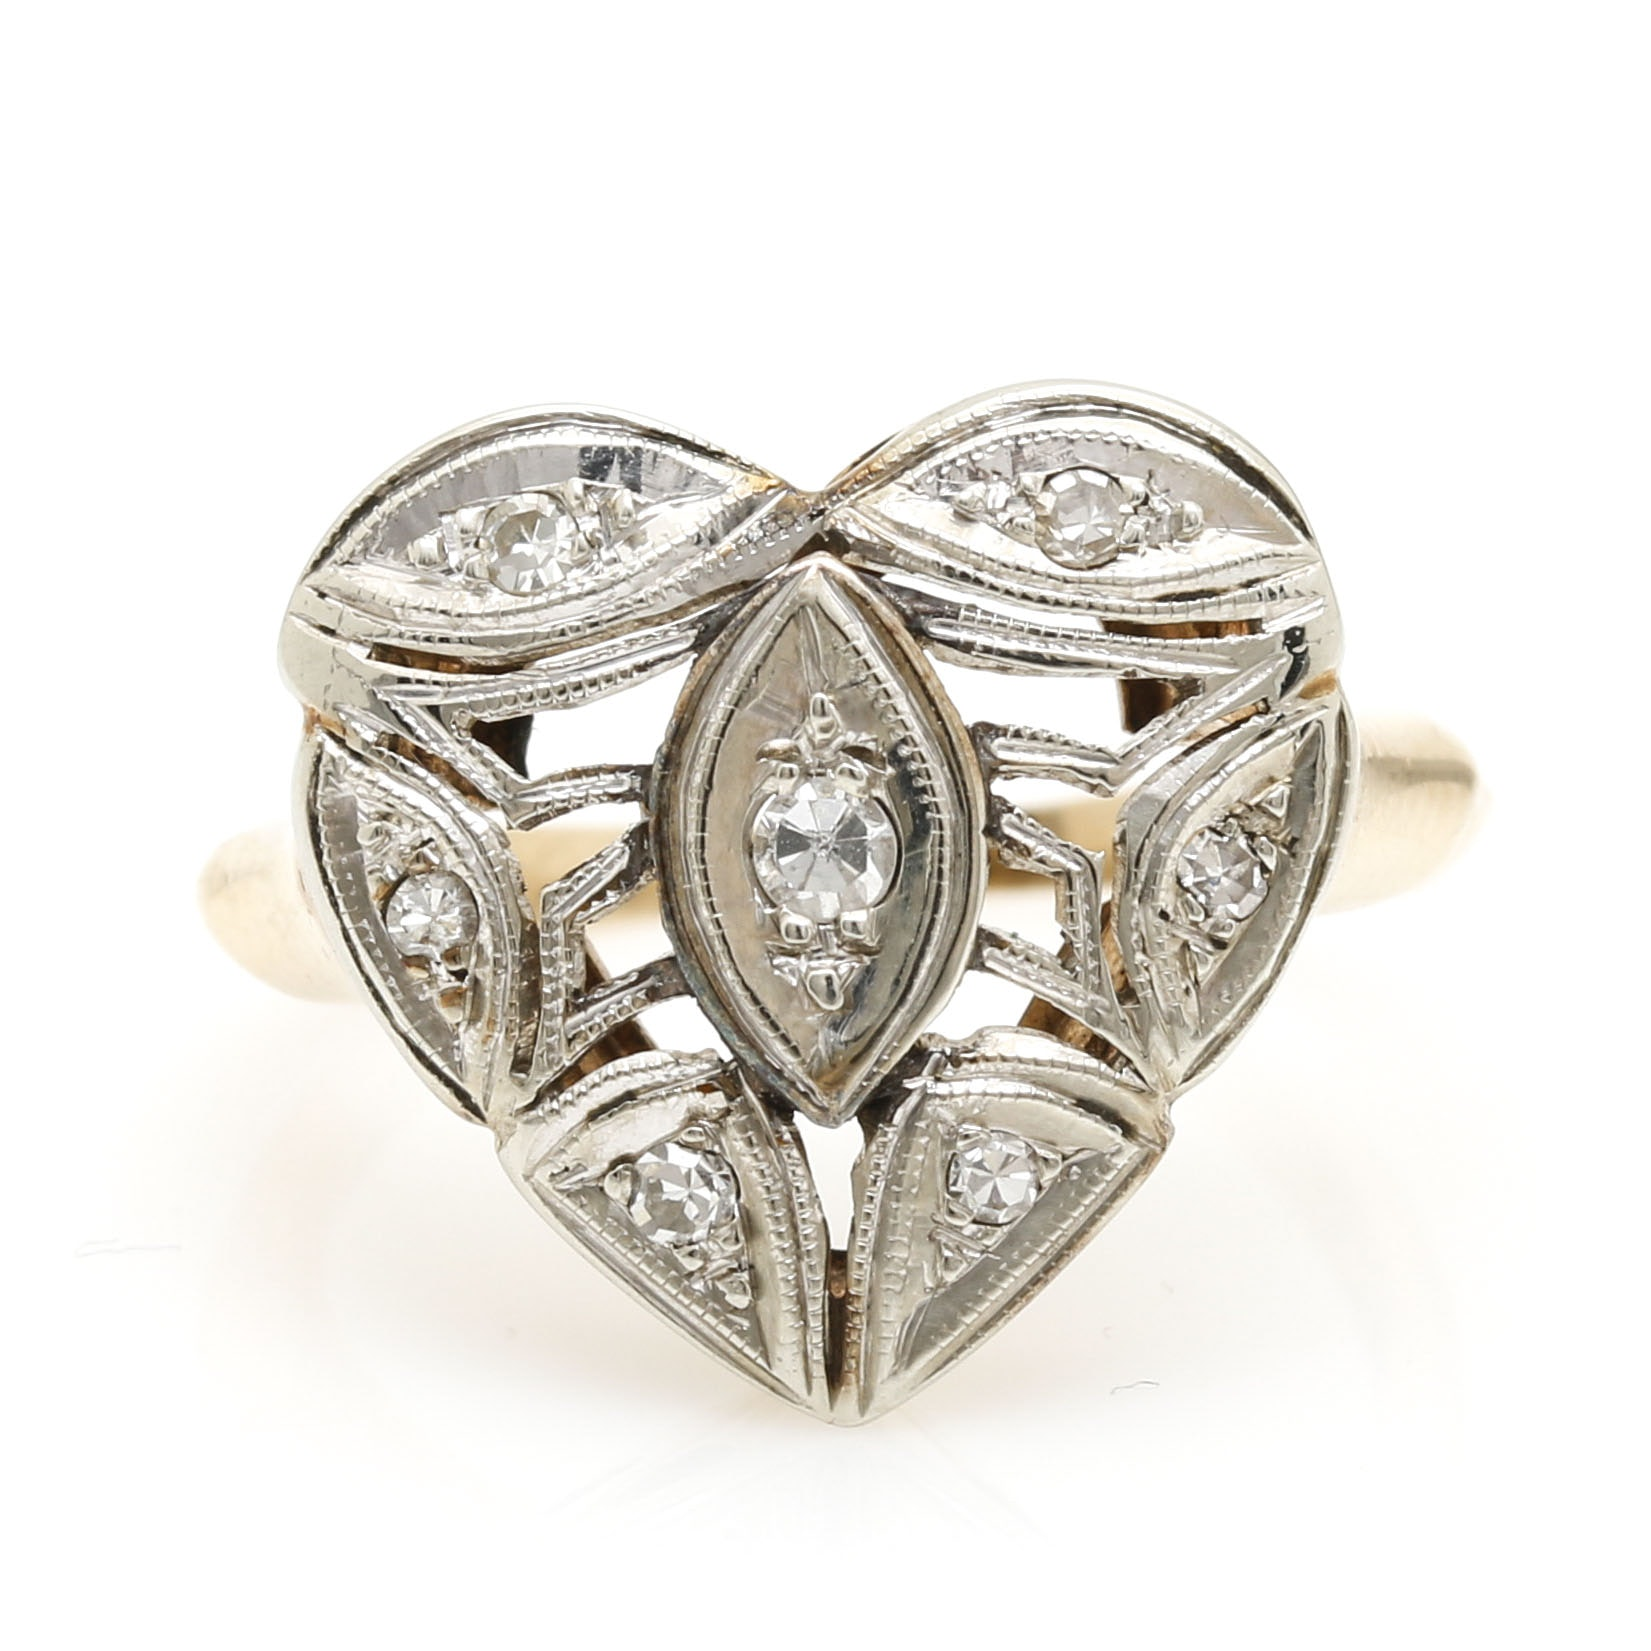 14K White and Yellow Gold Diamond Heart Ring